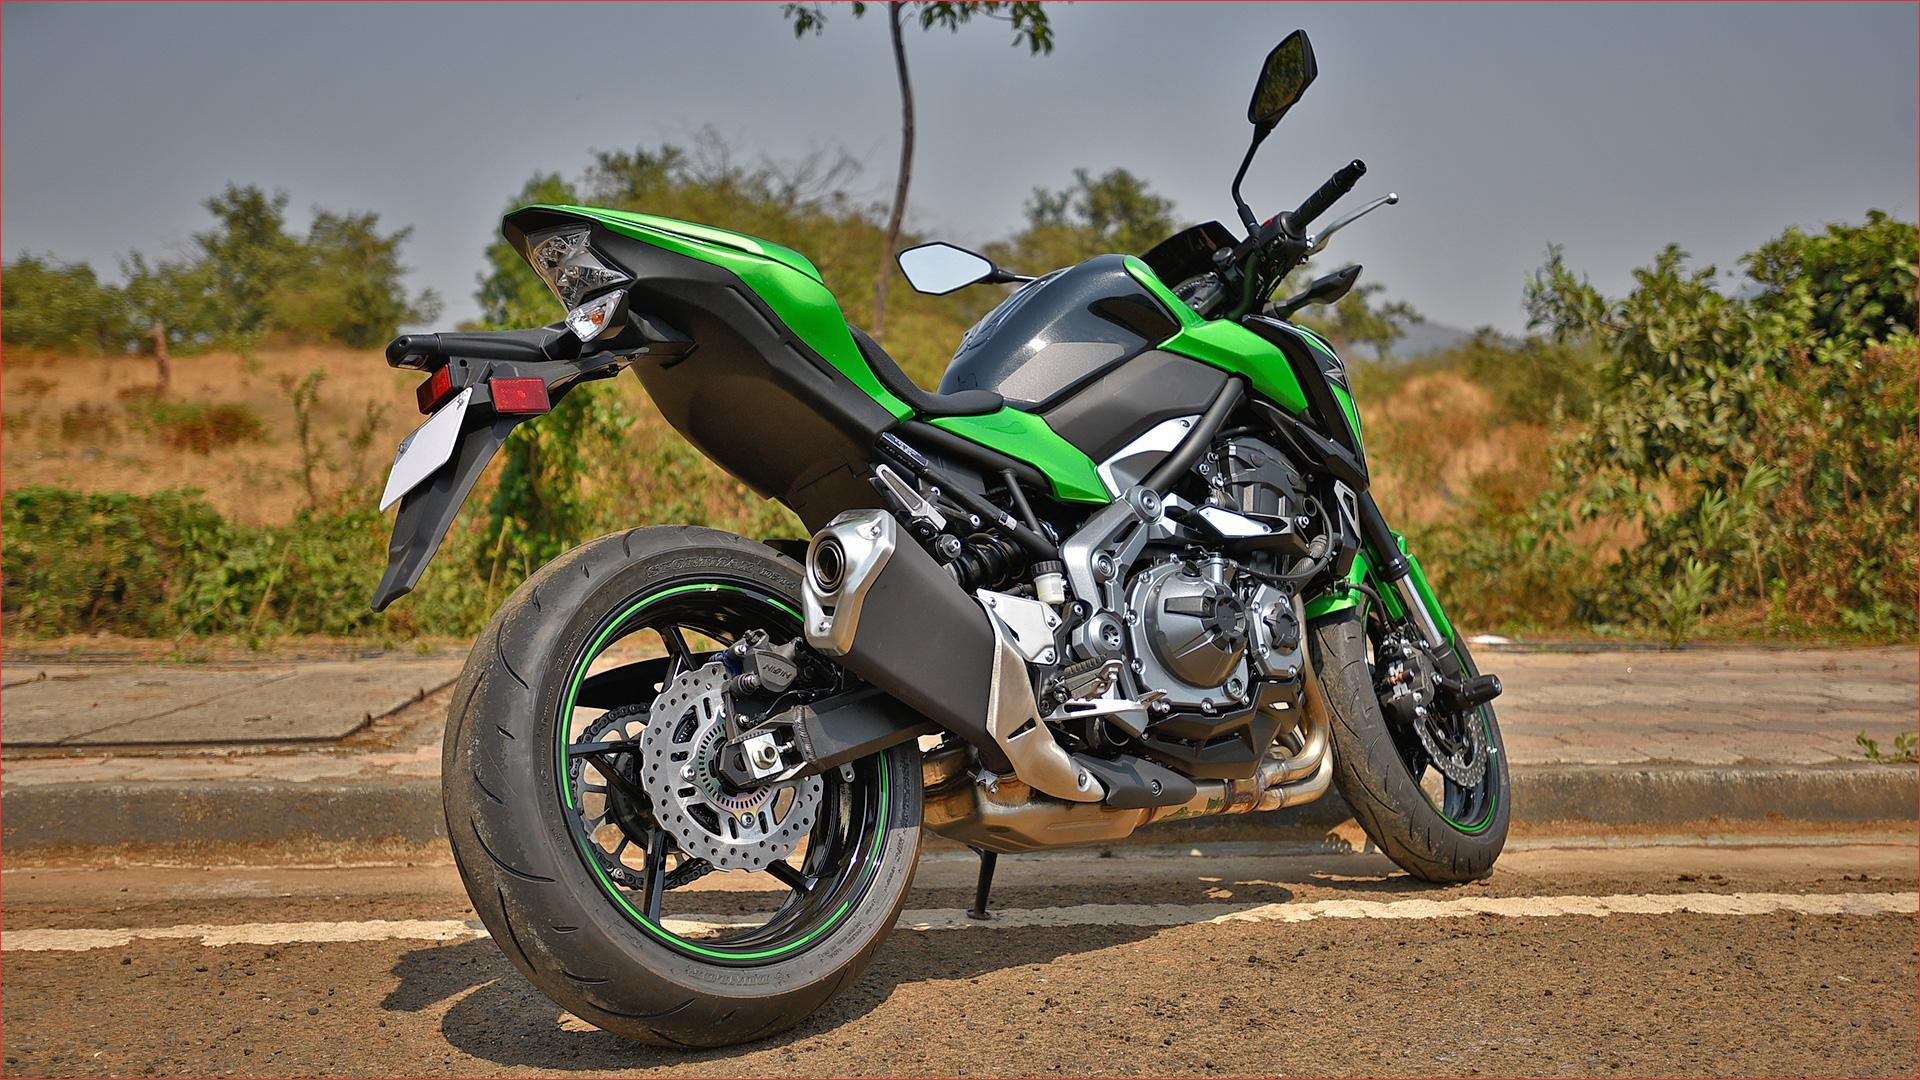 Тест-драйв мотоцикла Kawasaki Z750